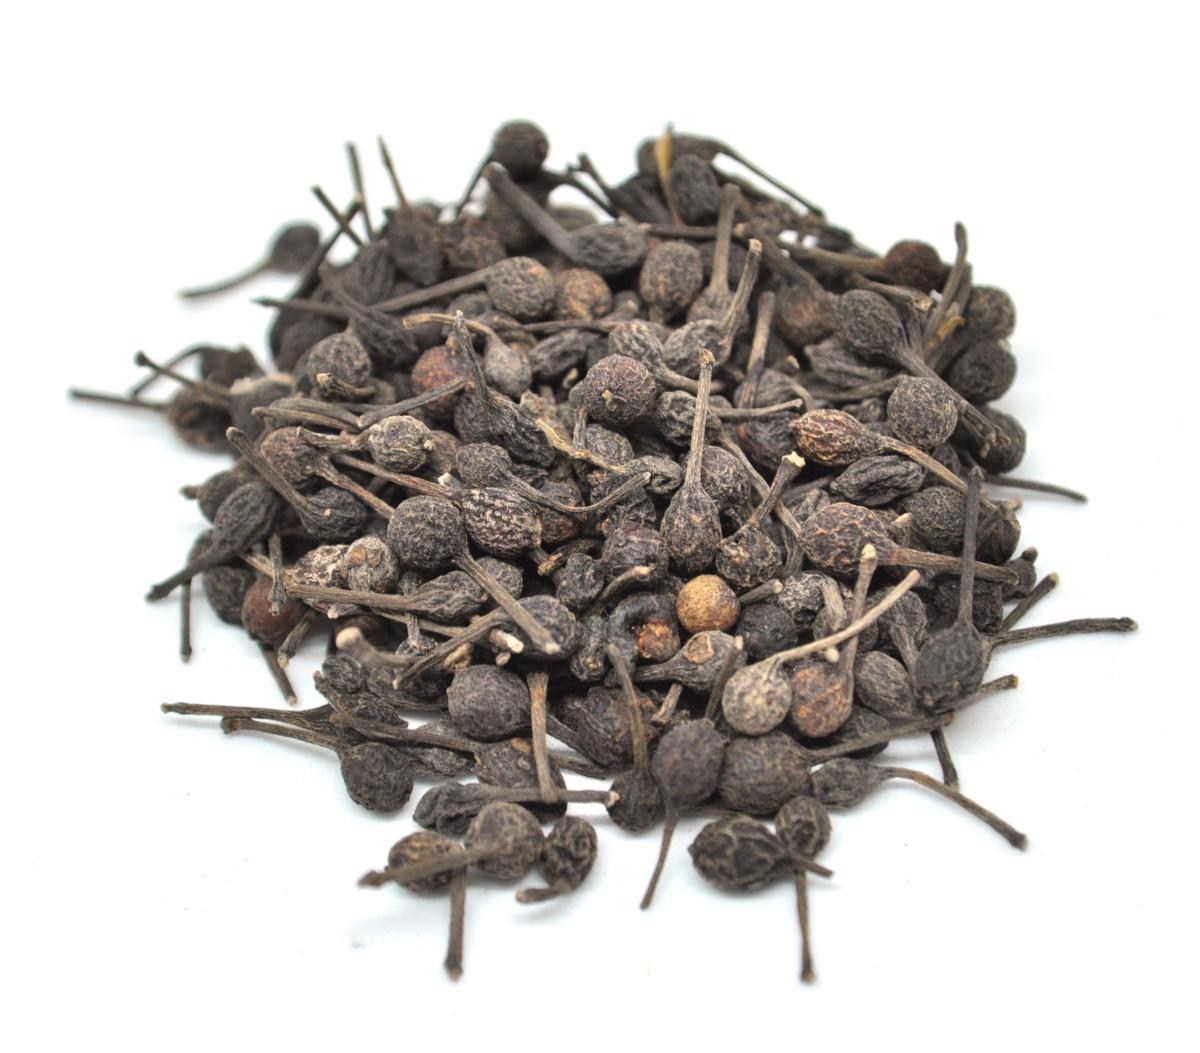 Voatsiperifery Pepper (Madagascar Wild Black Peppercorns)